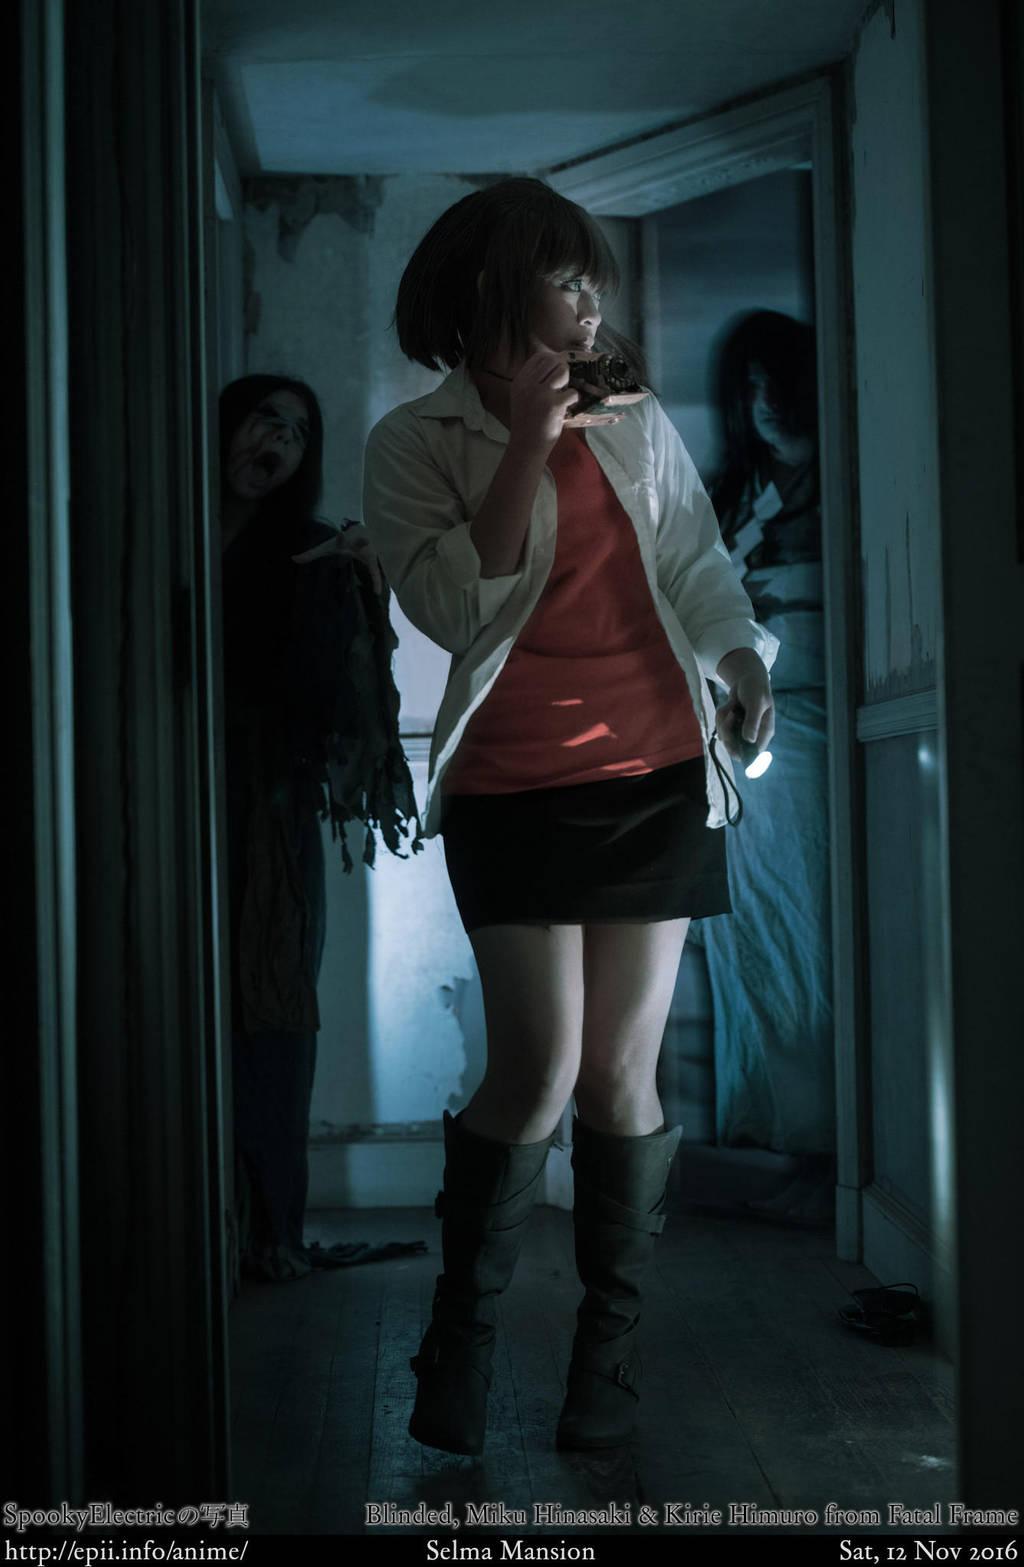 Fatal Frame by spooky-epiic